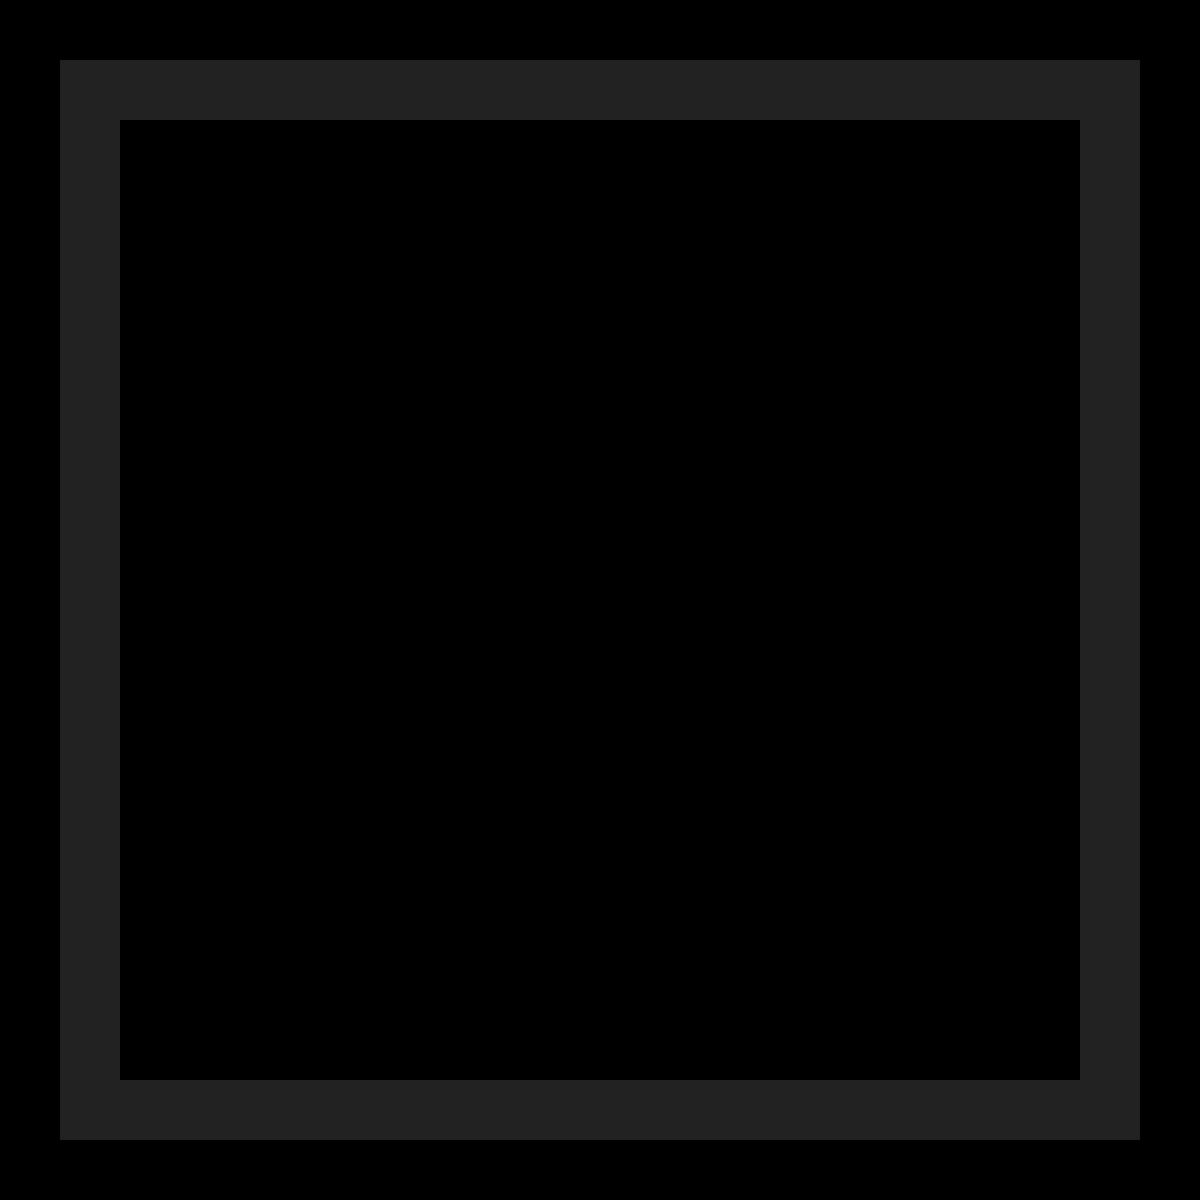 figure  line  form  graphic  geometry  shape  square icon icon